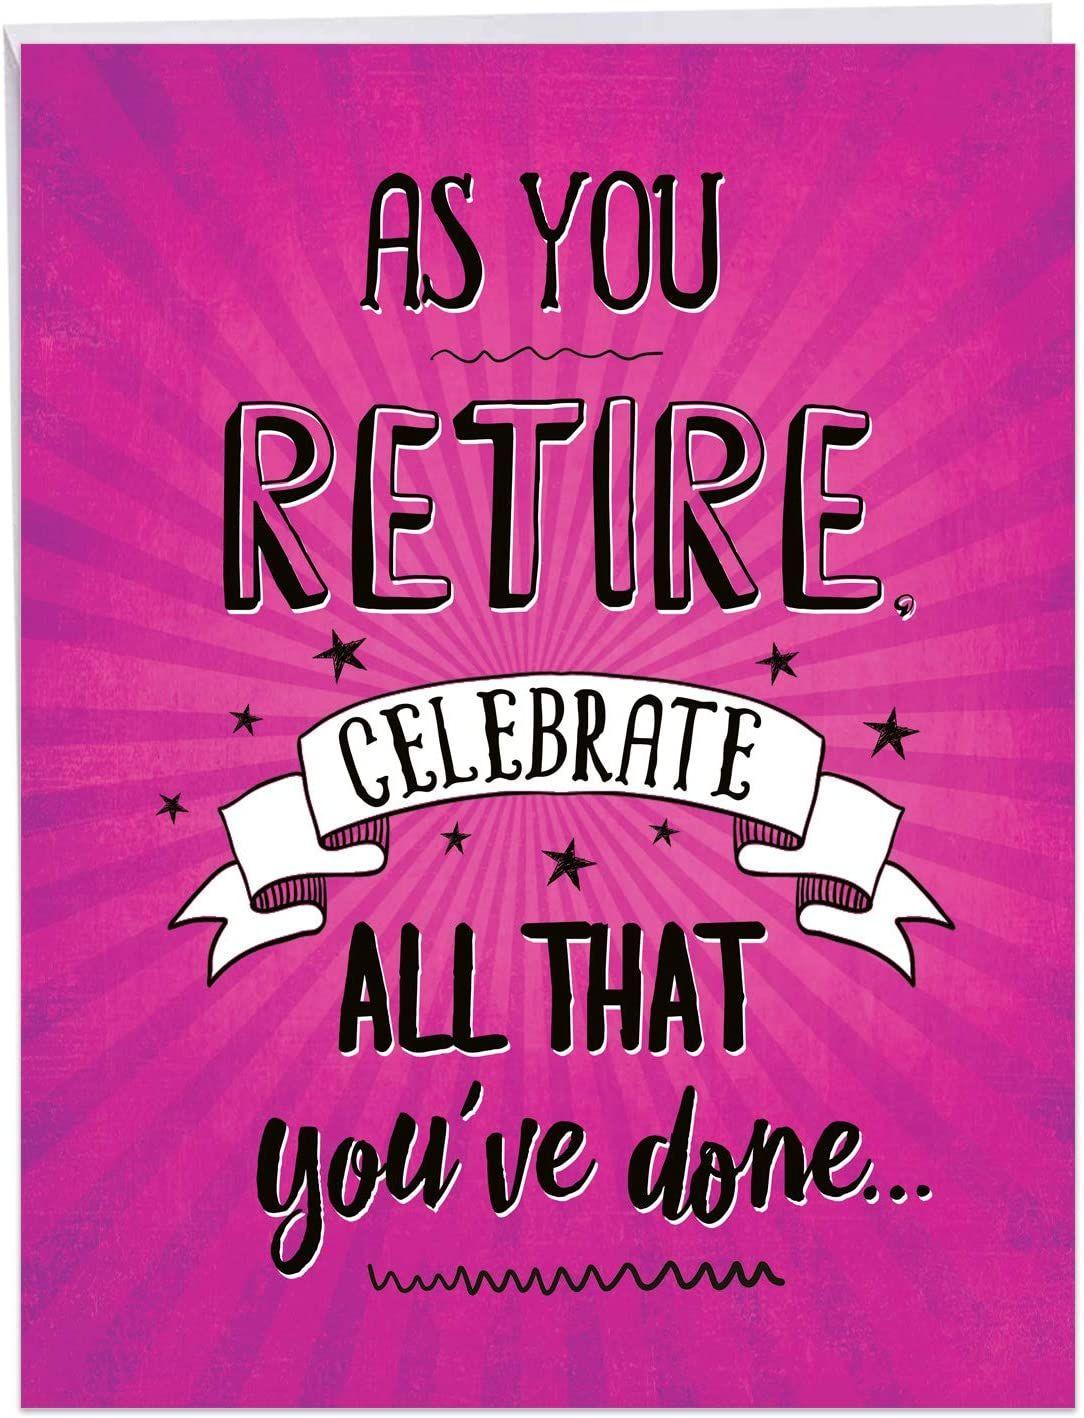 Farewell Card On Retirement Farewell Cards Retirement Cards Funny Retirement Cards